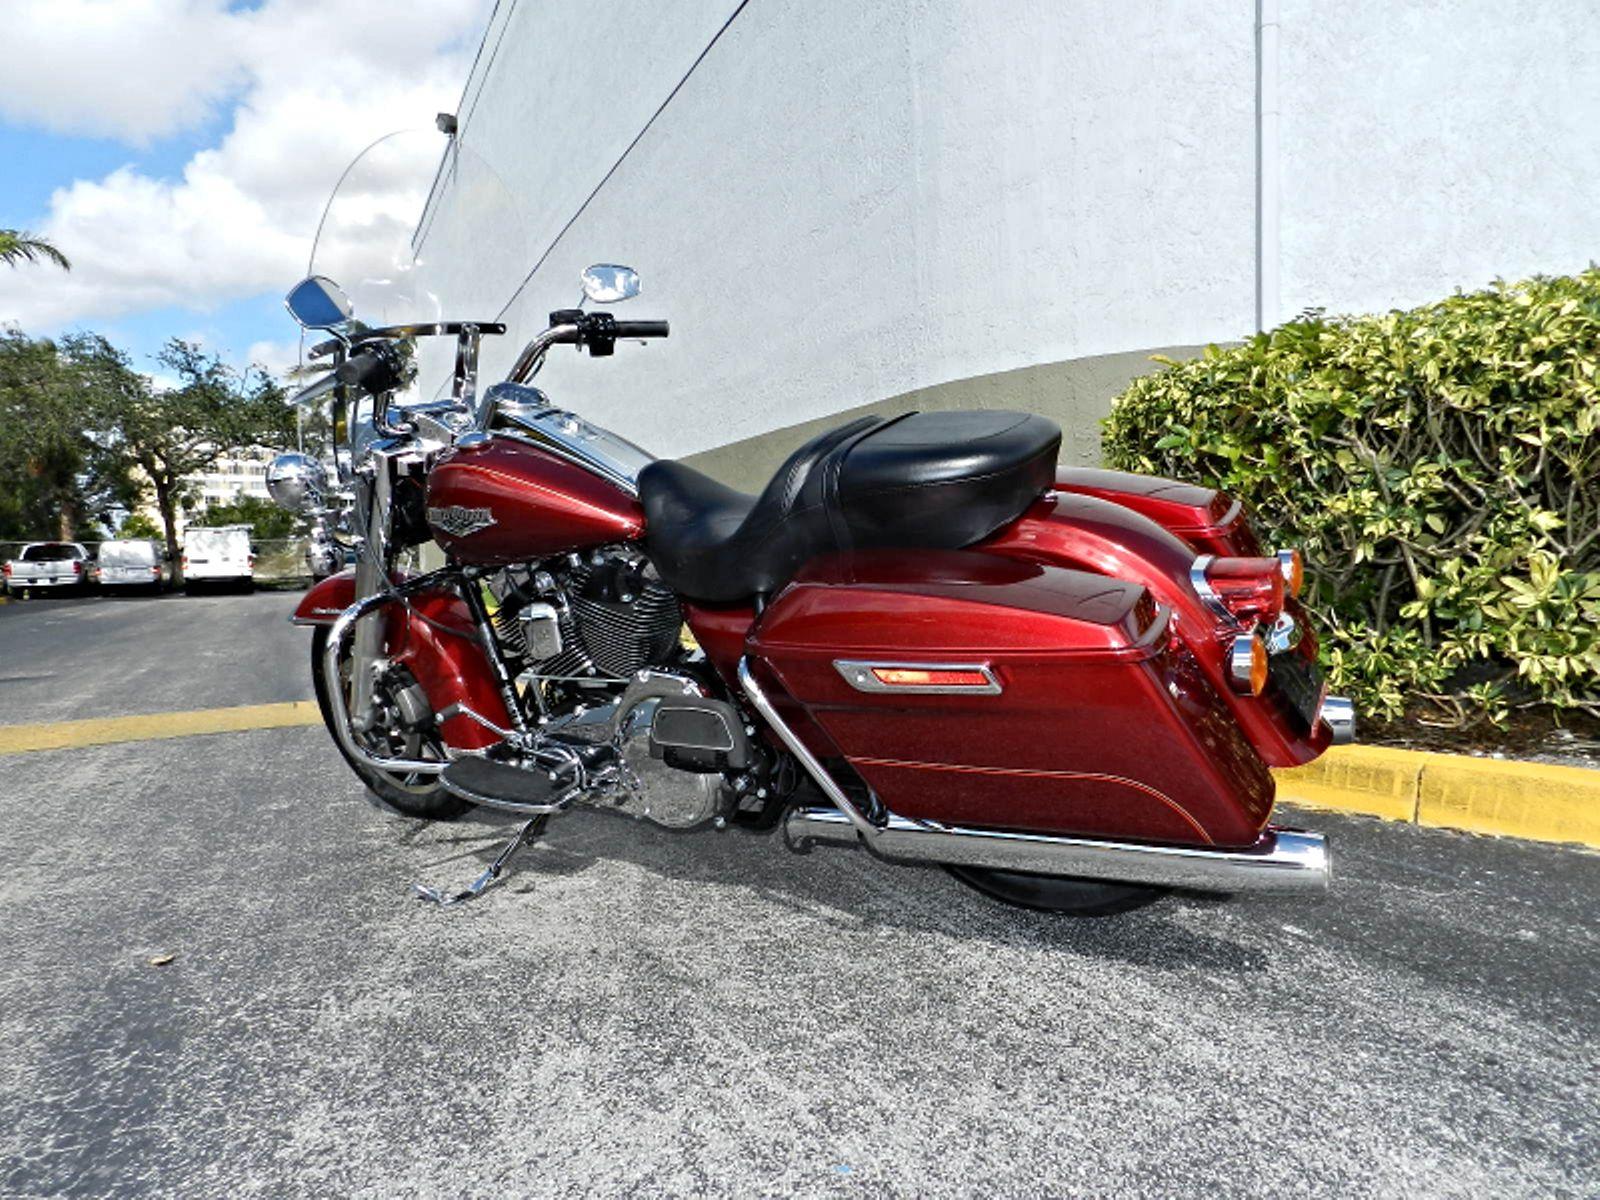 2016 Harley Davidson Motorcycle Warranty - Best Motorcycle 2018